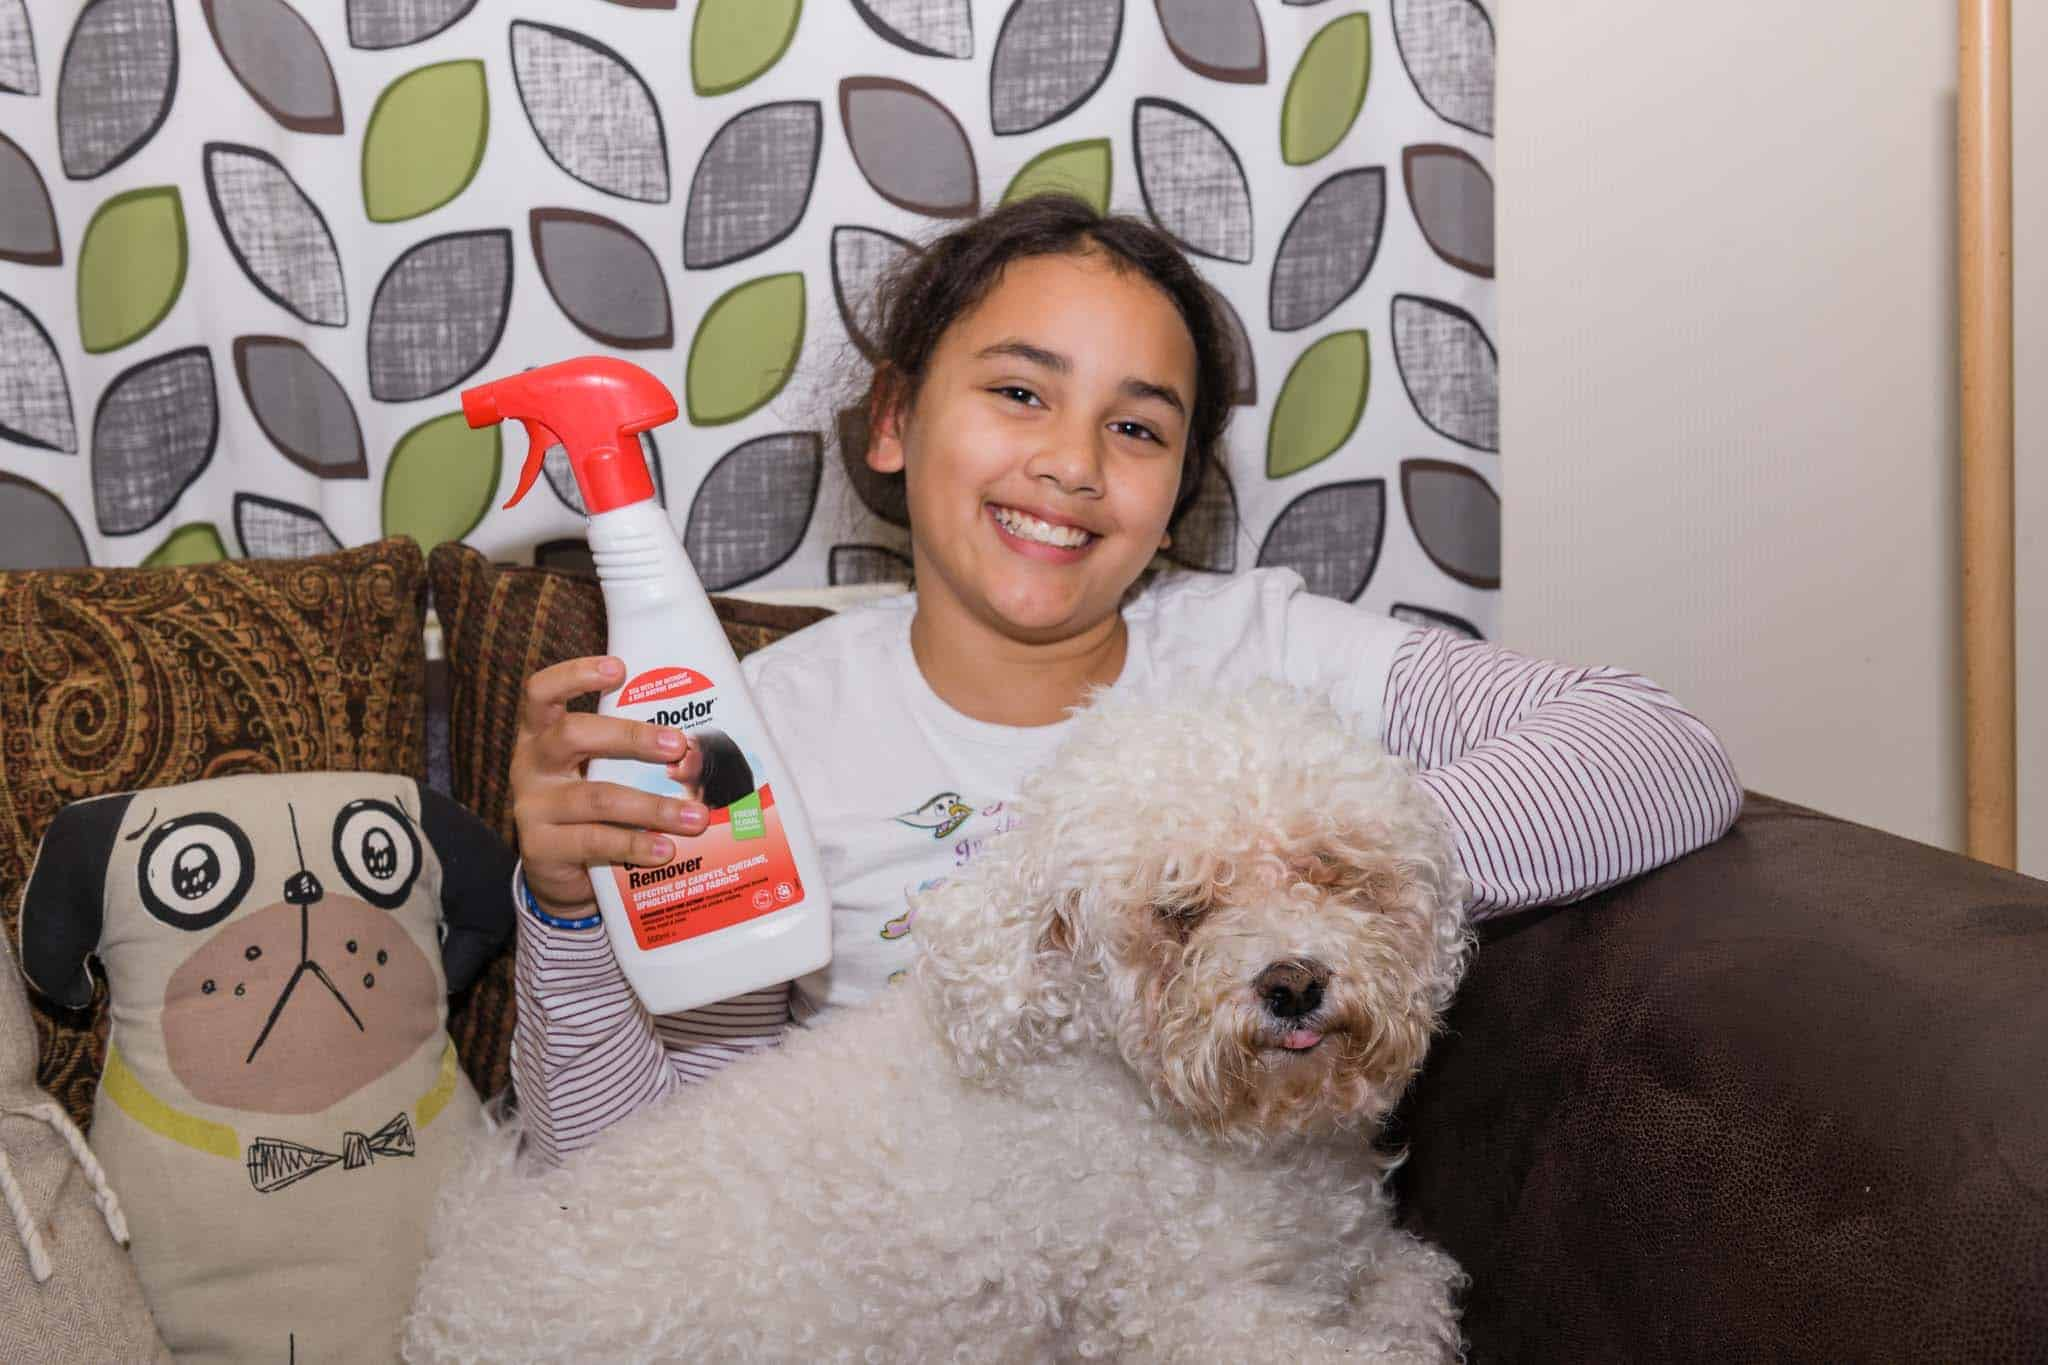 removing pet urine with rug doctor urine eliminator